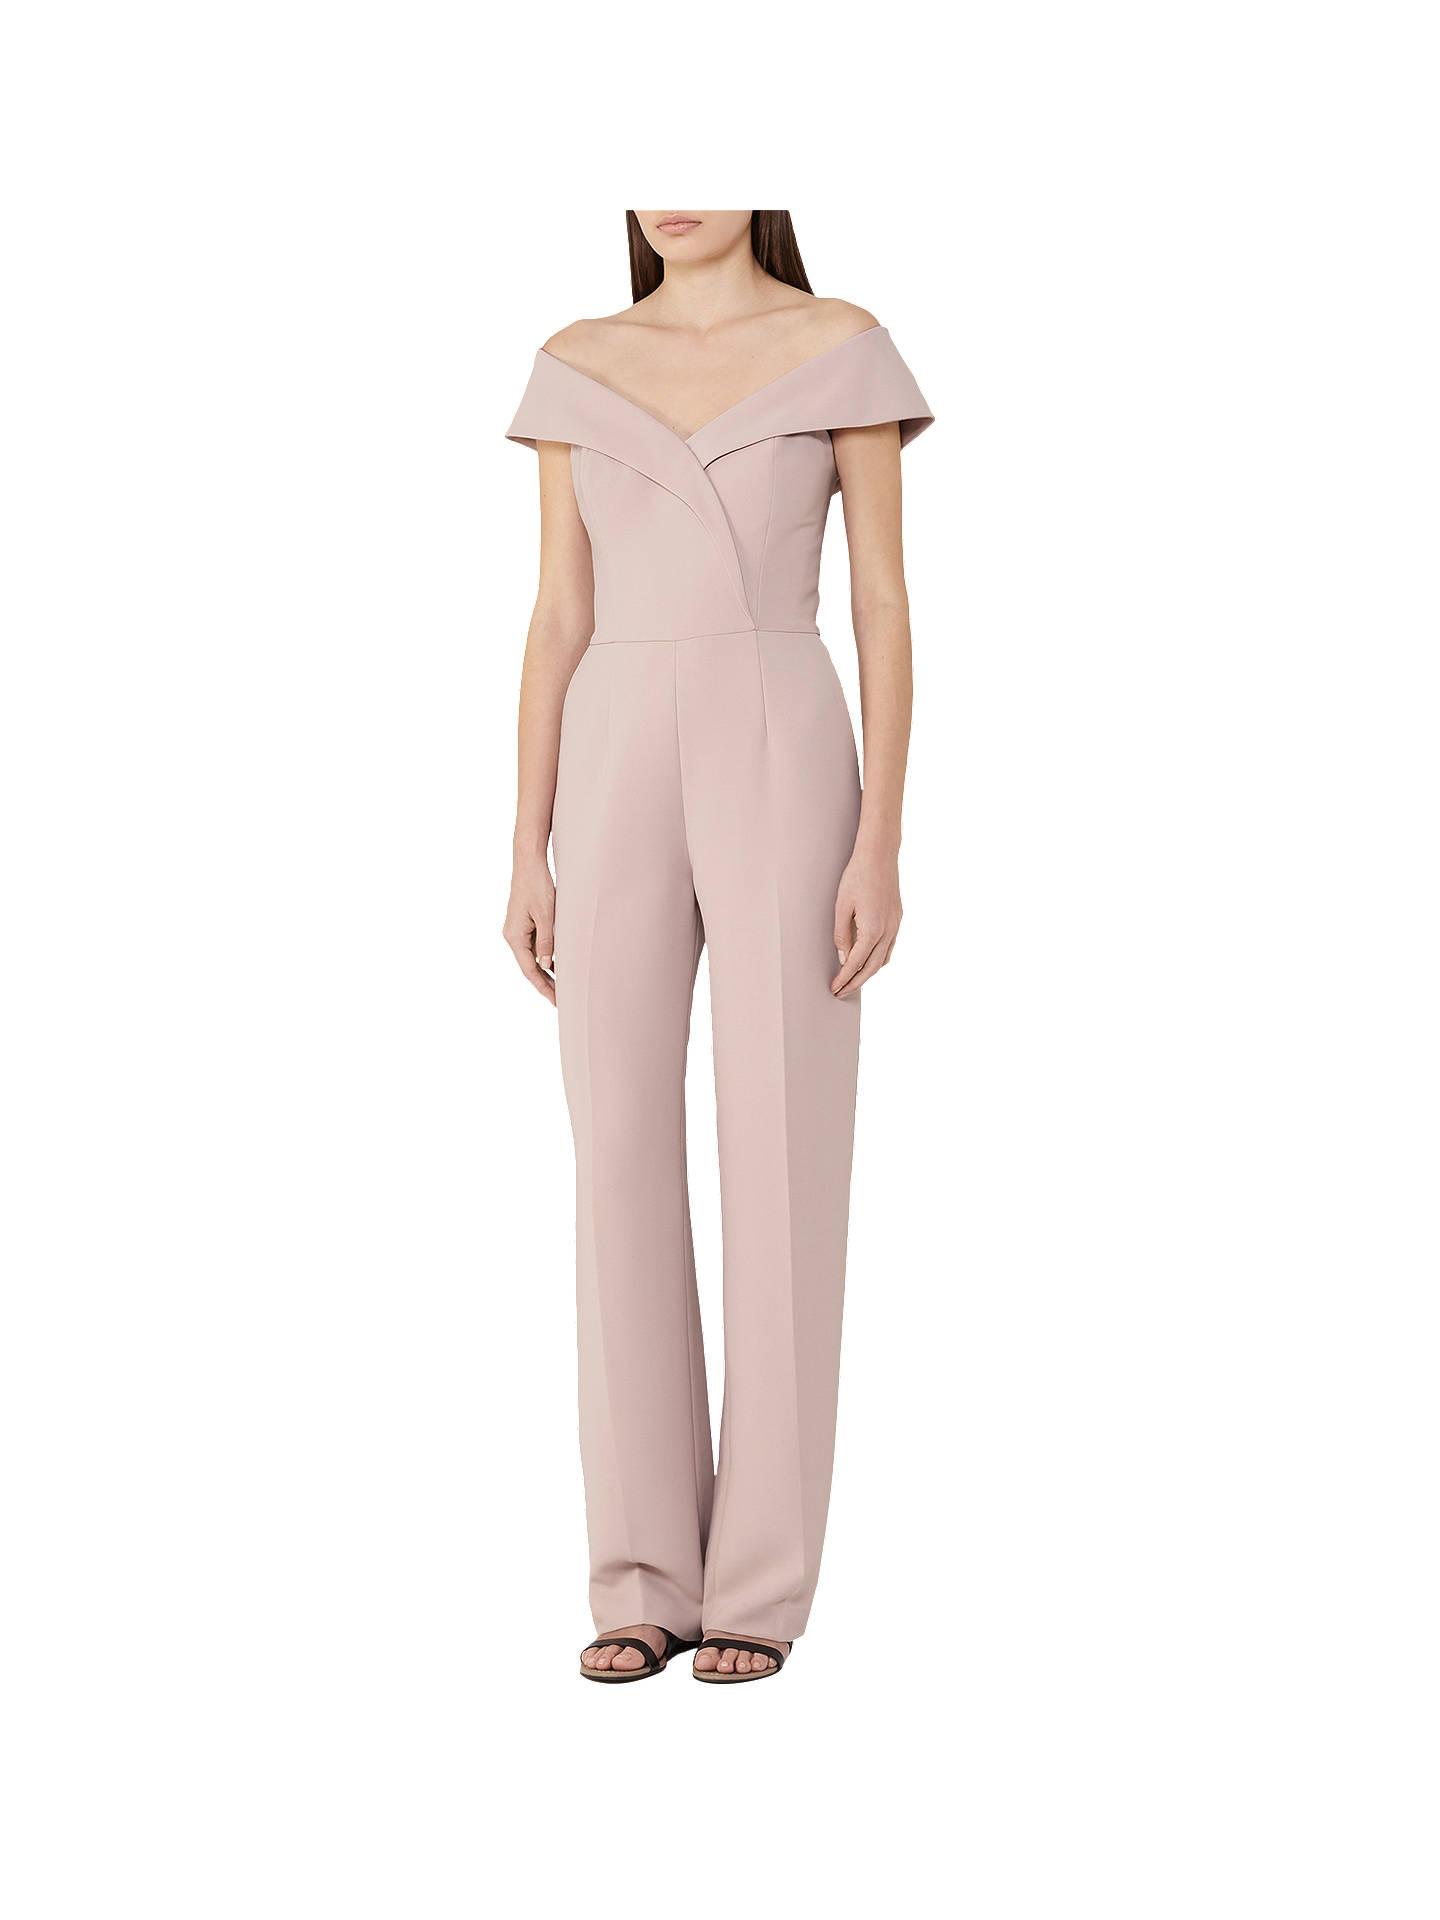 9cb7b70190 Buy Reiss Adina Off Shoulder Jumpsuit